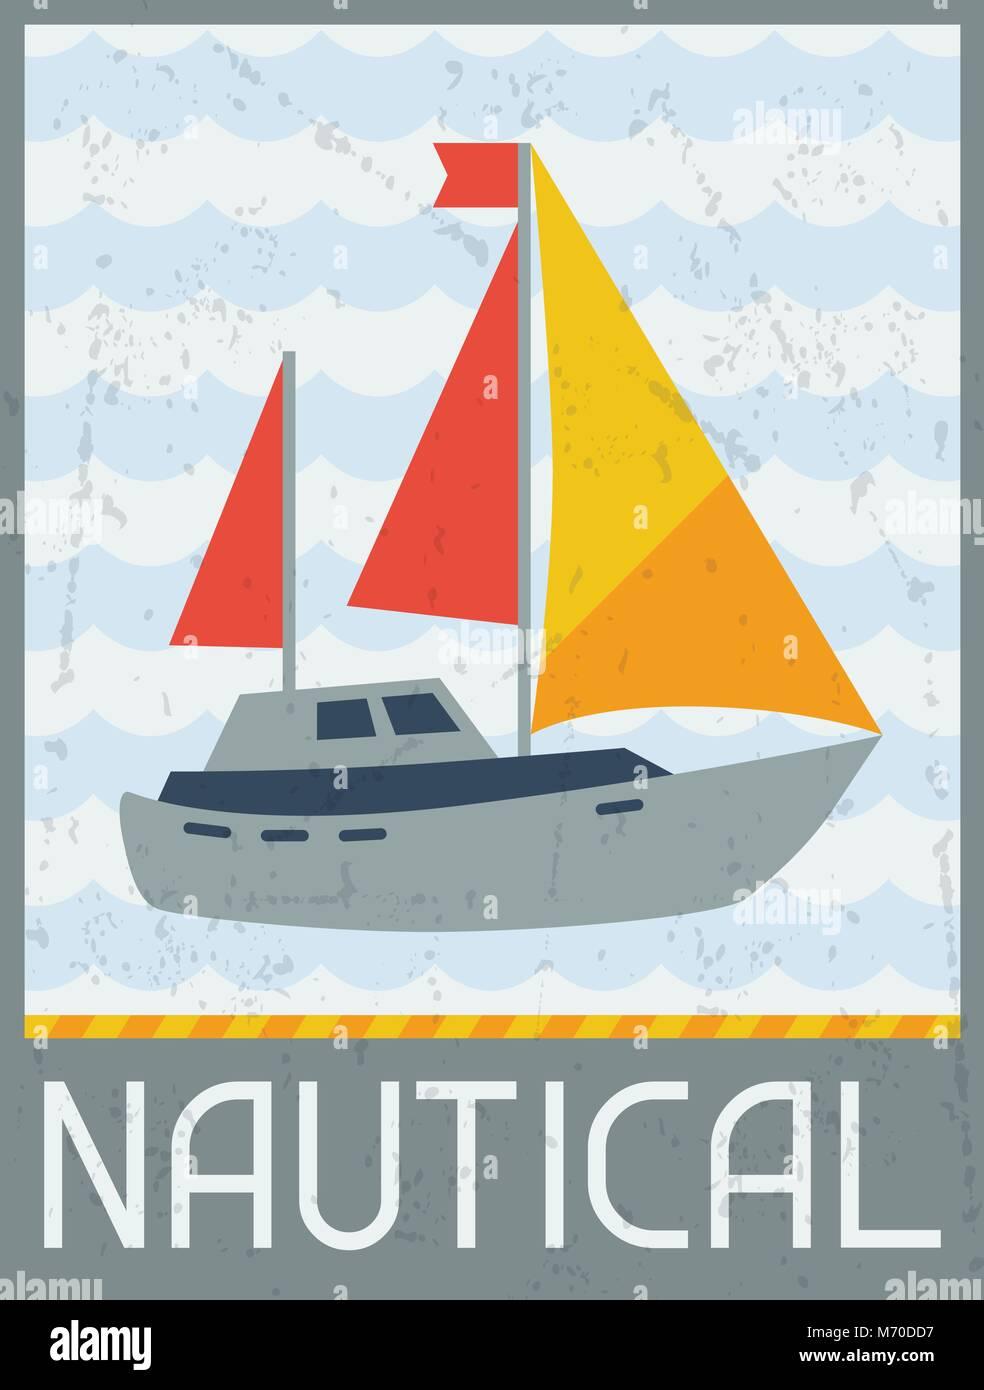 Nautical. Retro poster in flat design style - Stock Vector